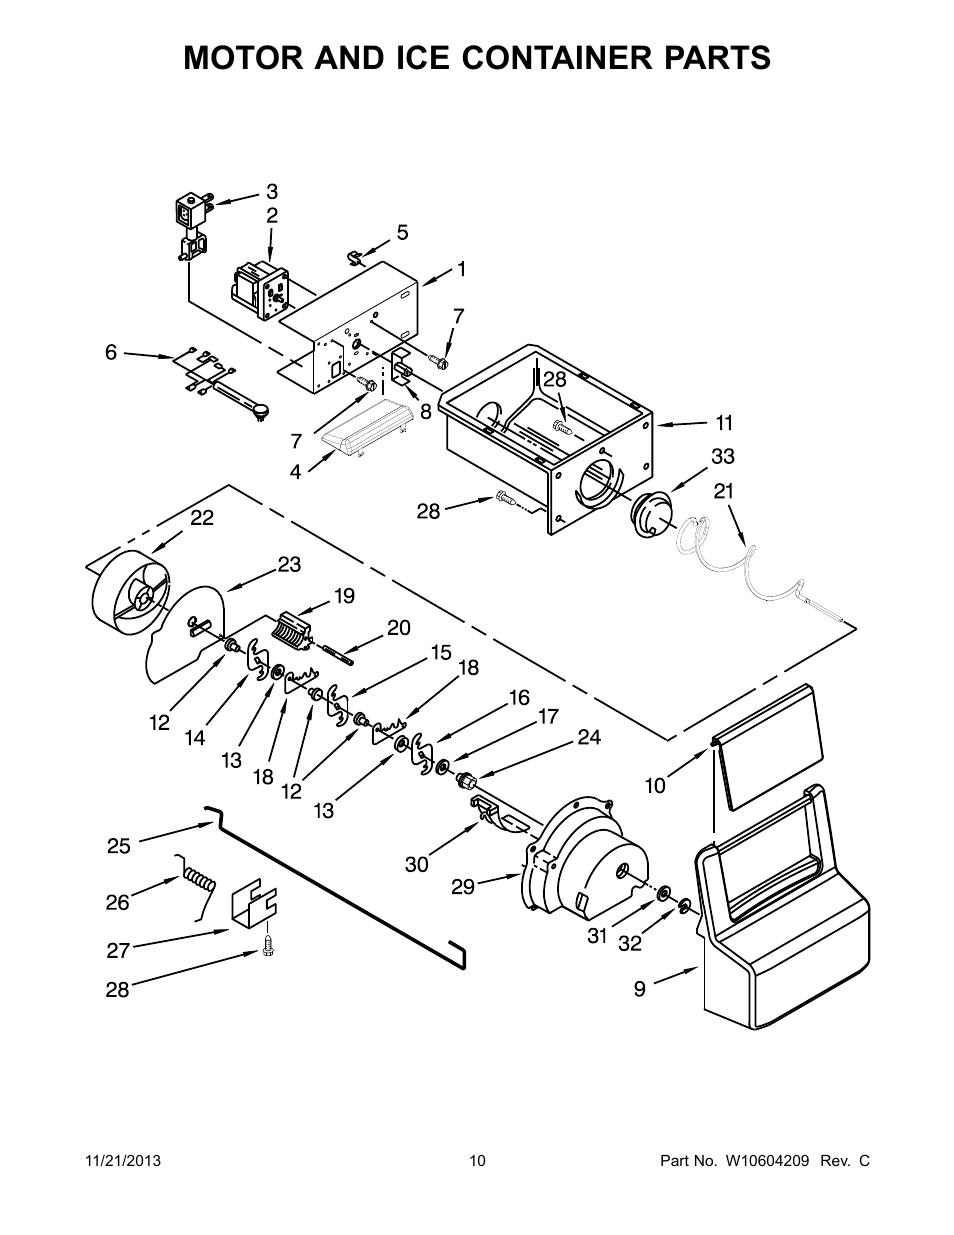 Motor and ice container, Motor and ice container parts